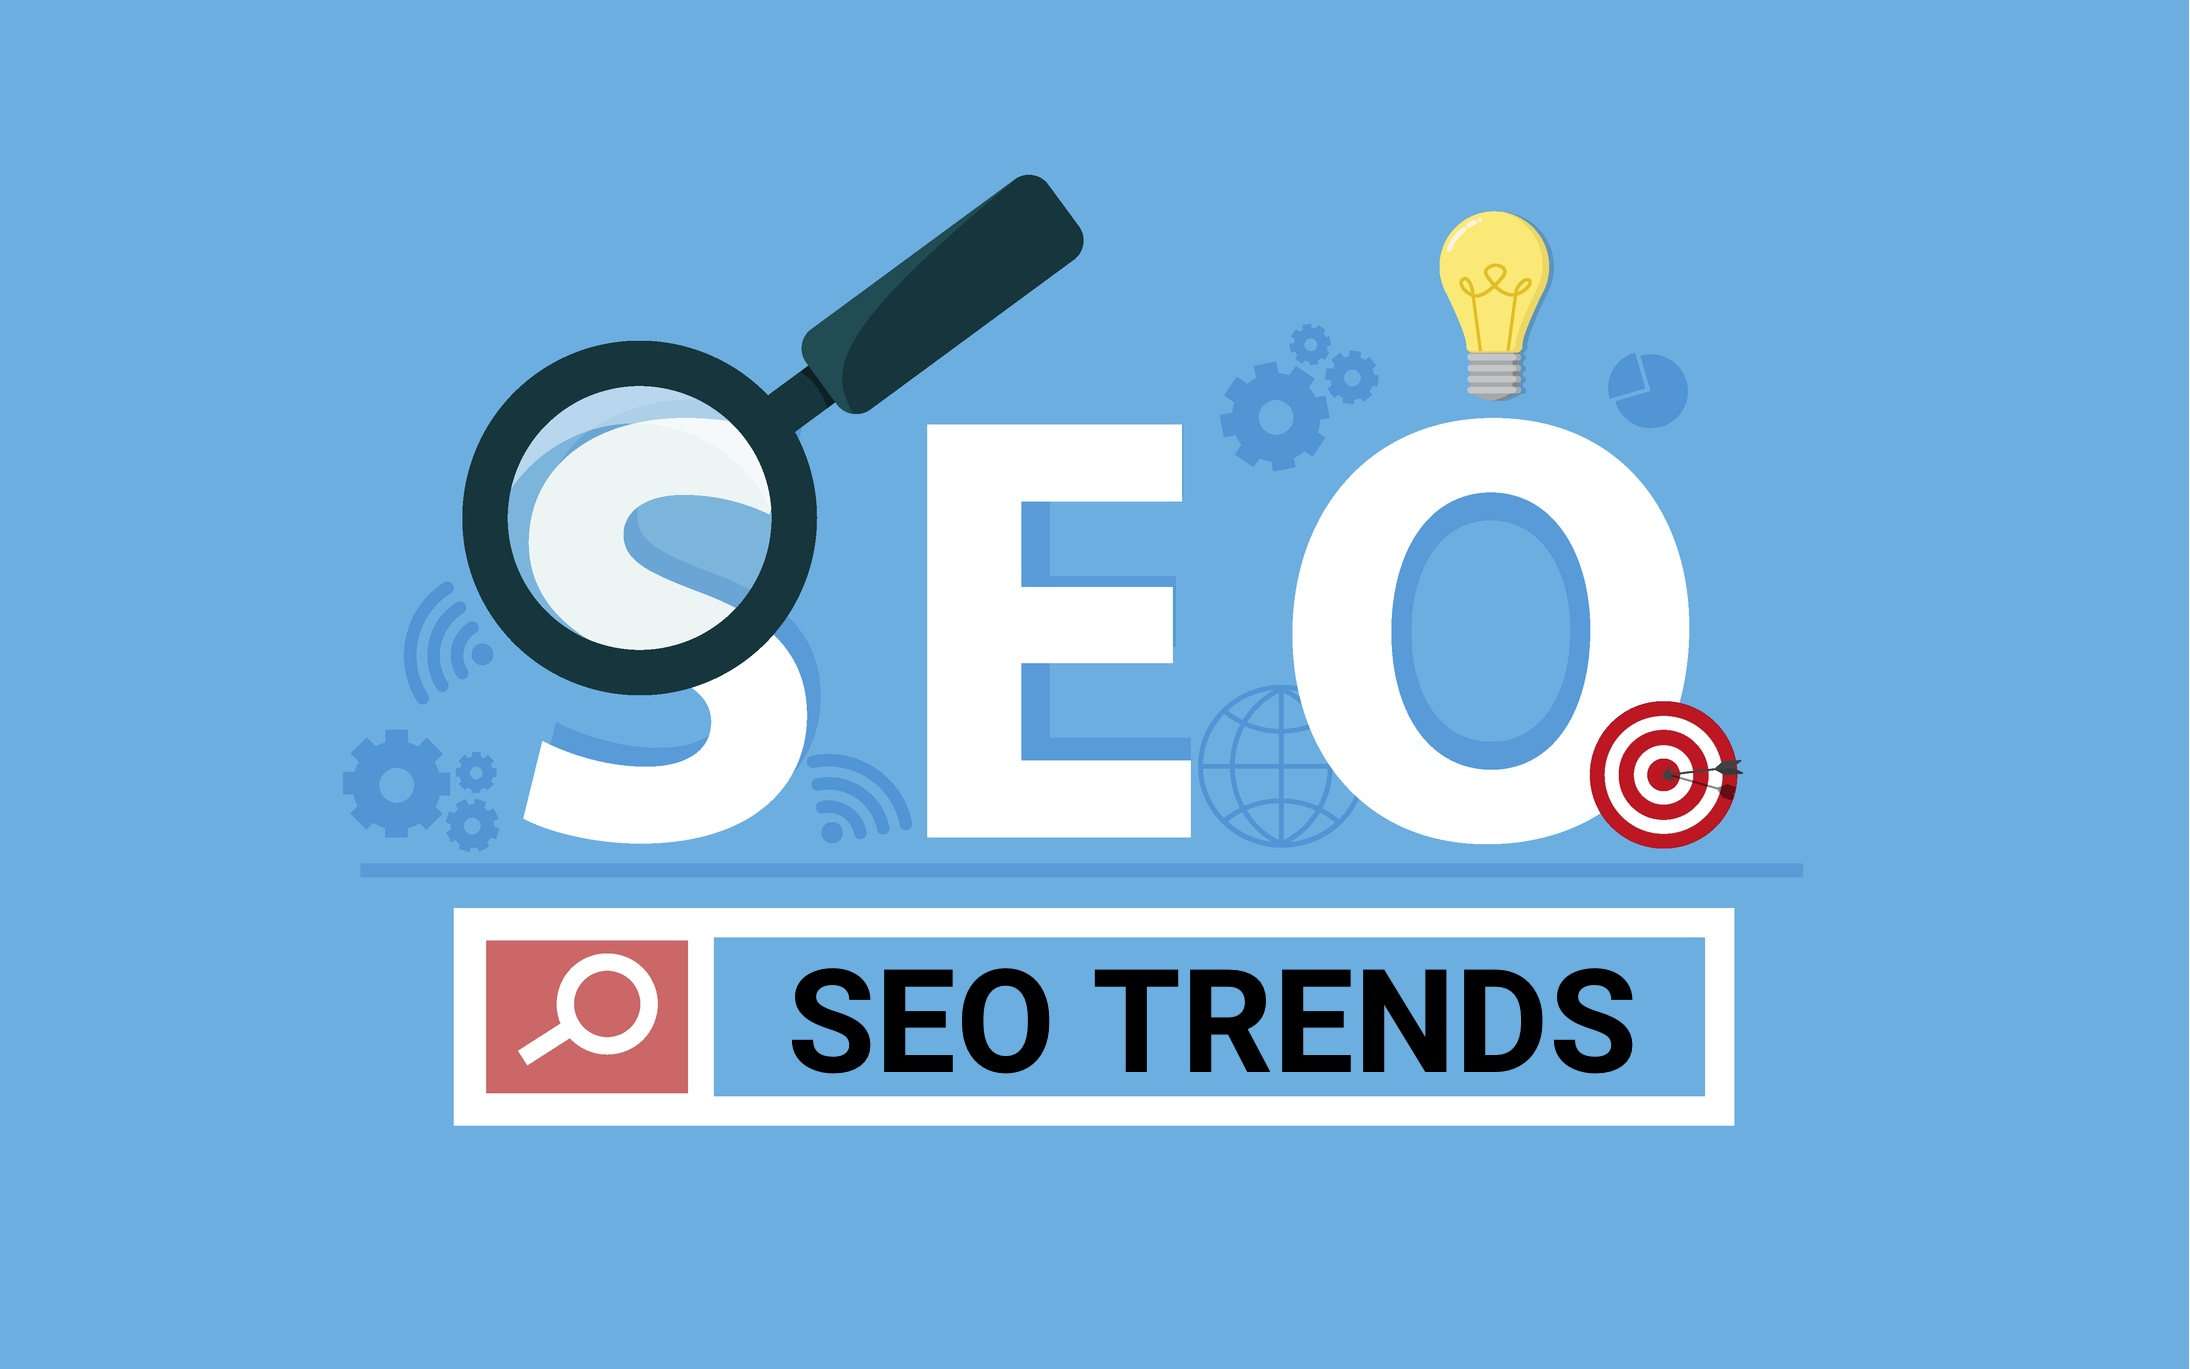 SEO Trends to Keep an Eye On